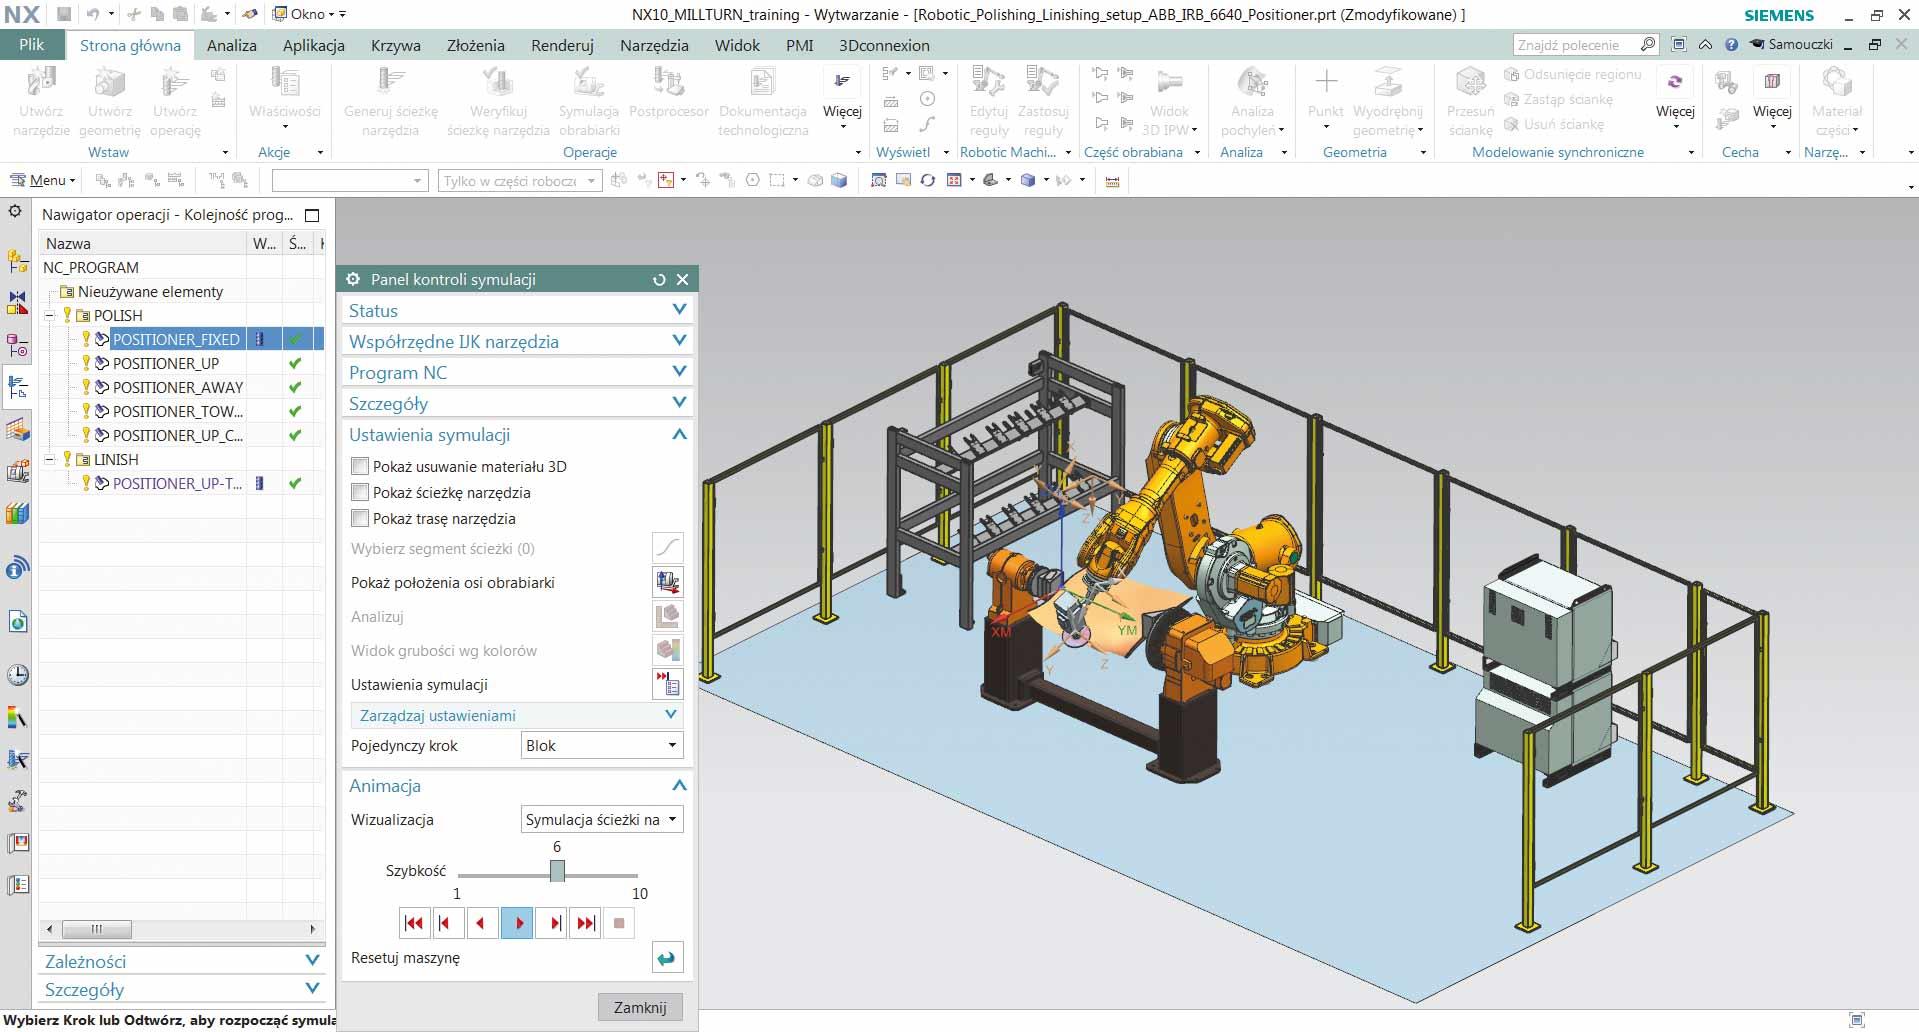 Interfejs użytkownika w programie NX CAM Robotics.